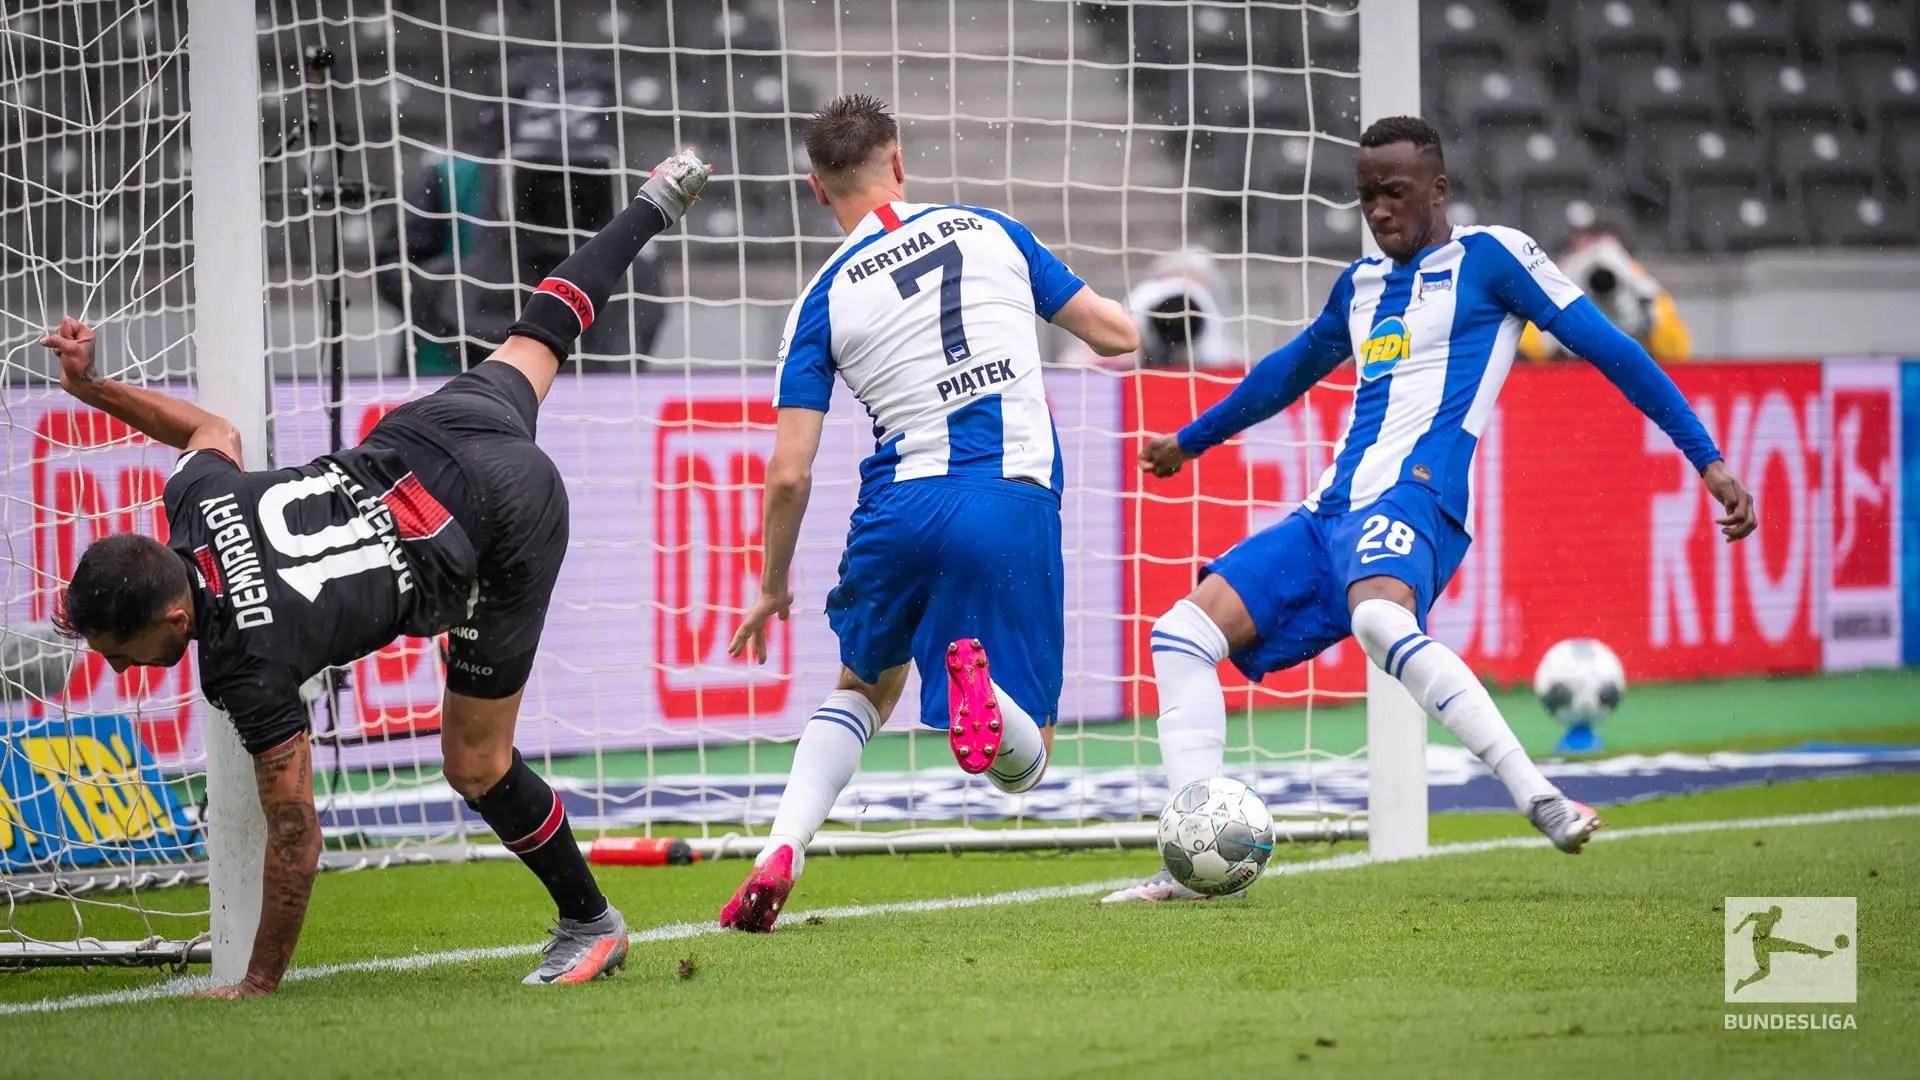 Bundesliga: Collins Struggles In Paderborn's Home Loss; Ehizibue, Ujah, Sarenren Bazee All In action